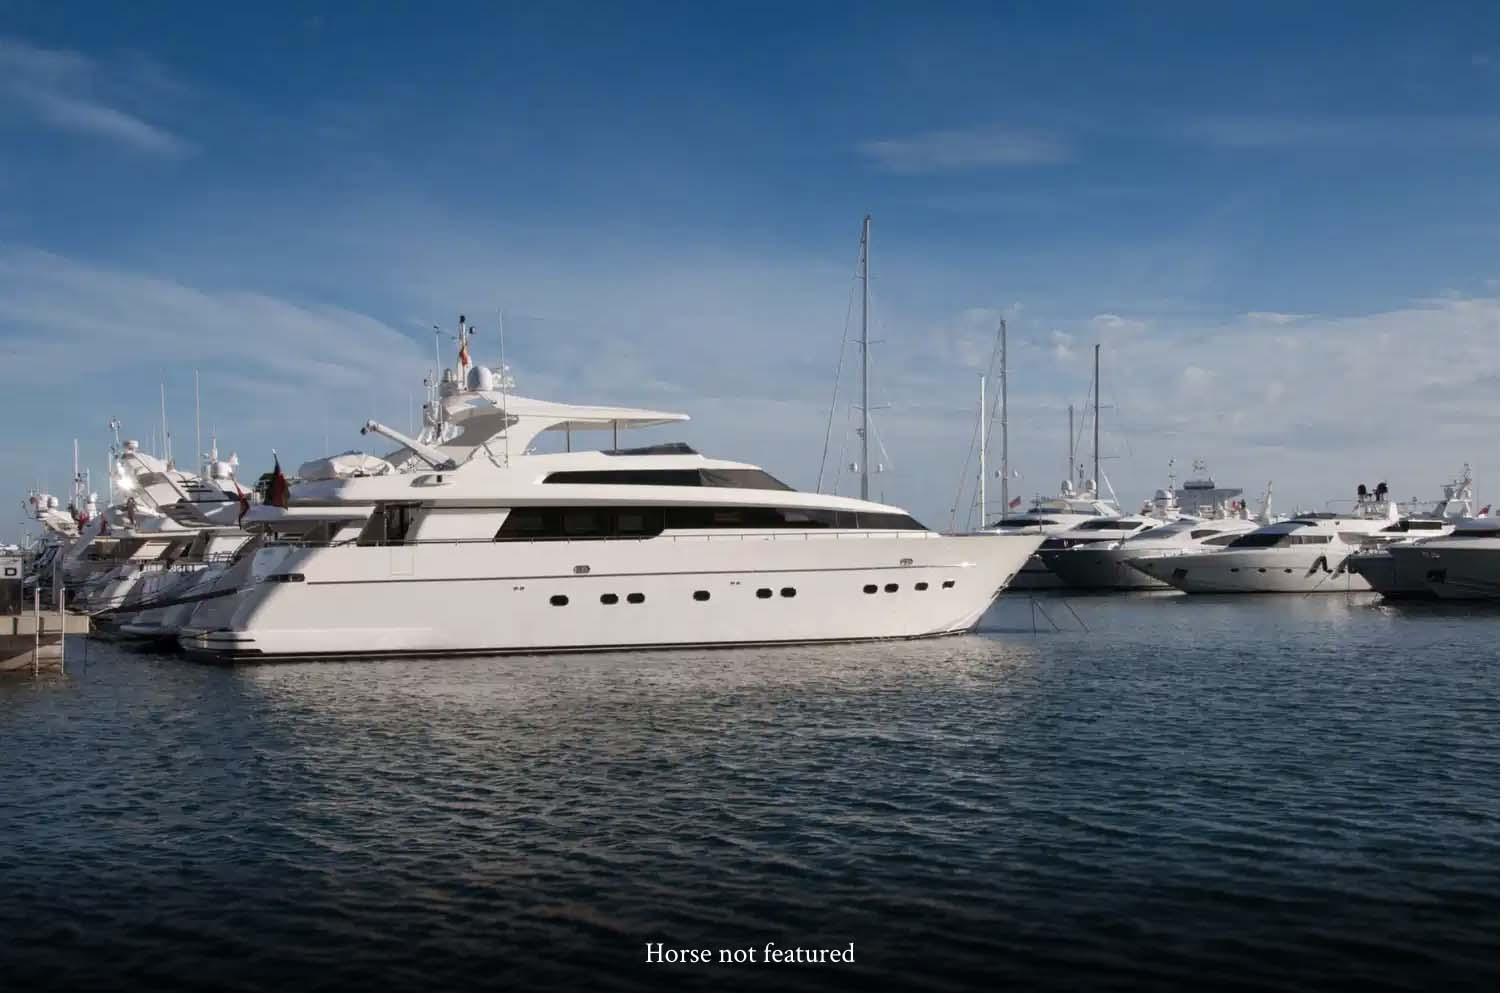 Damon Stapleton: Advertising. Sometimes a yacht needs a horse.